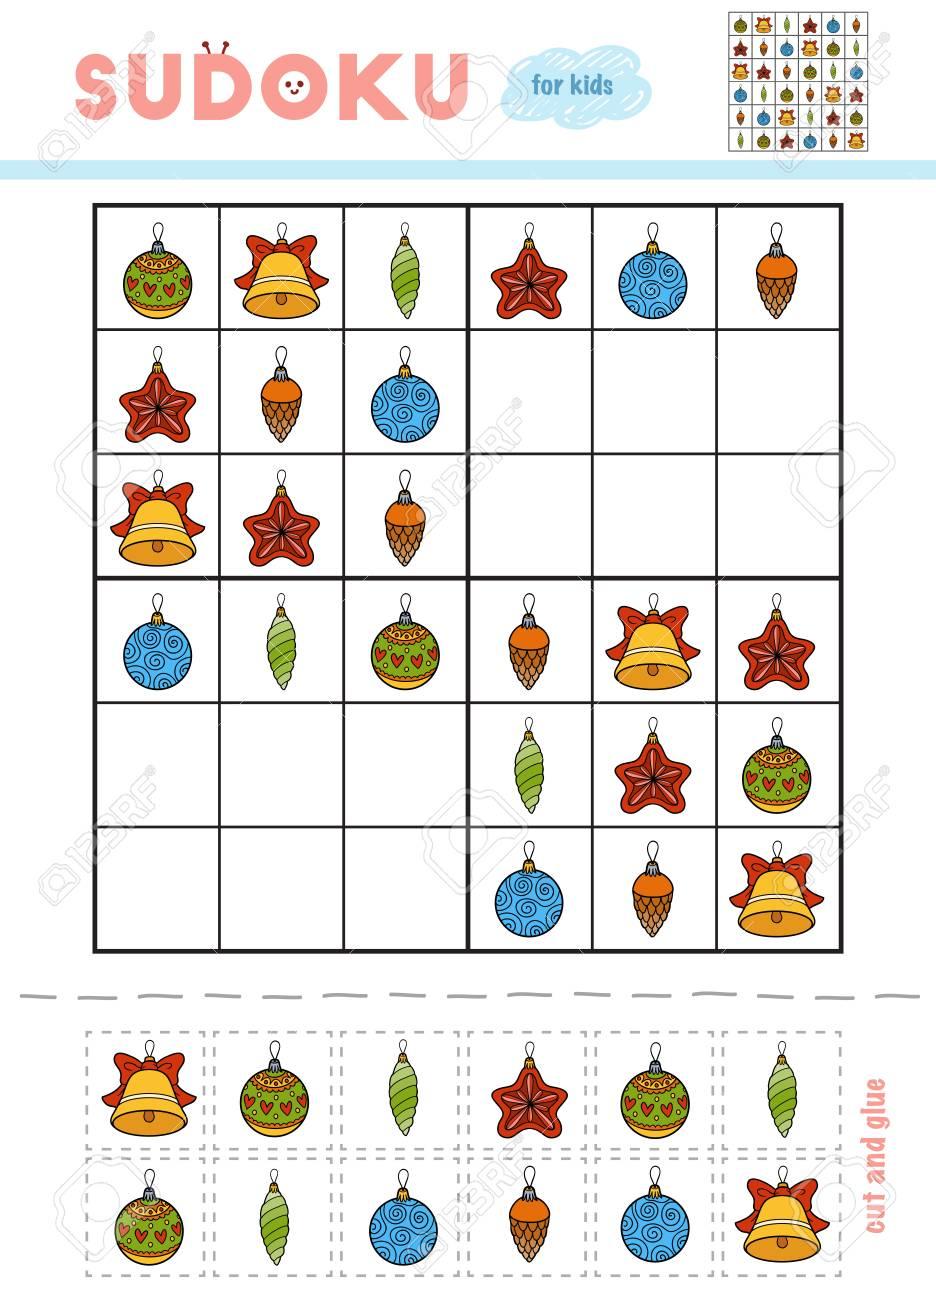 Christmas Sudoku.Sudoku For Children Education Game Set Of Christmas Toys Use